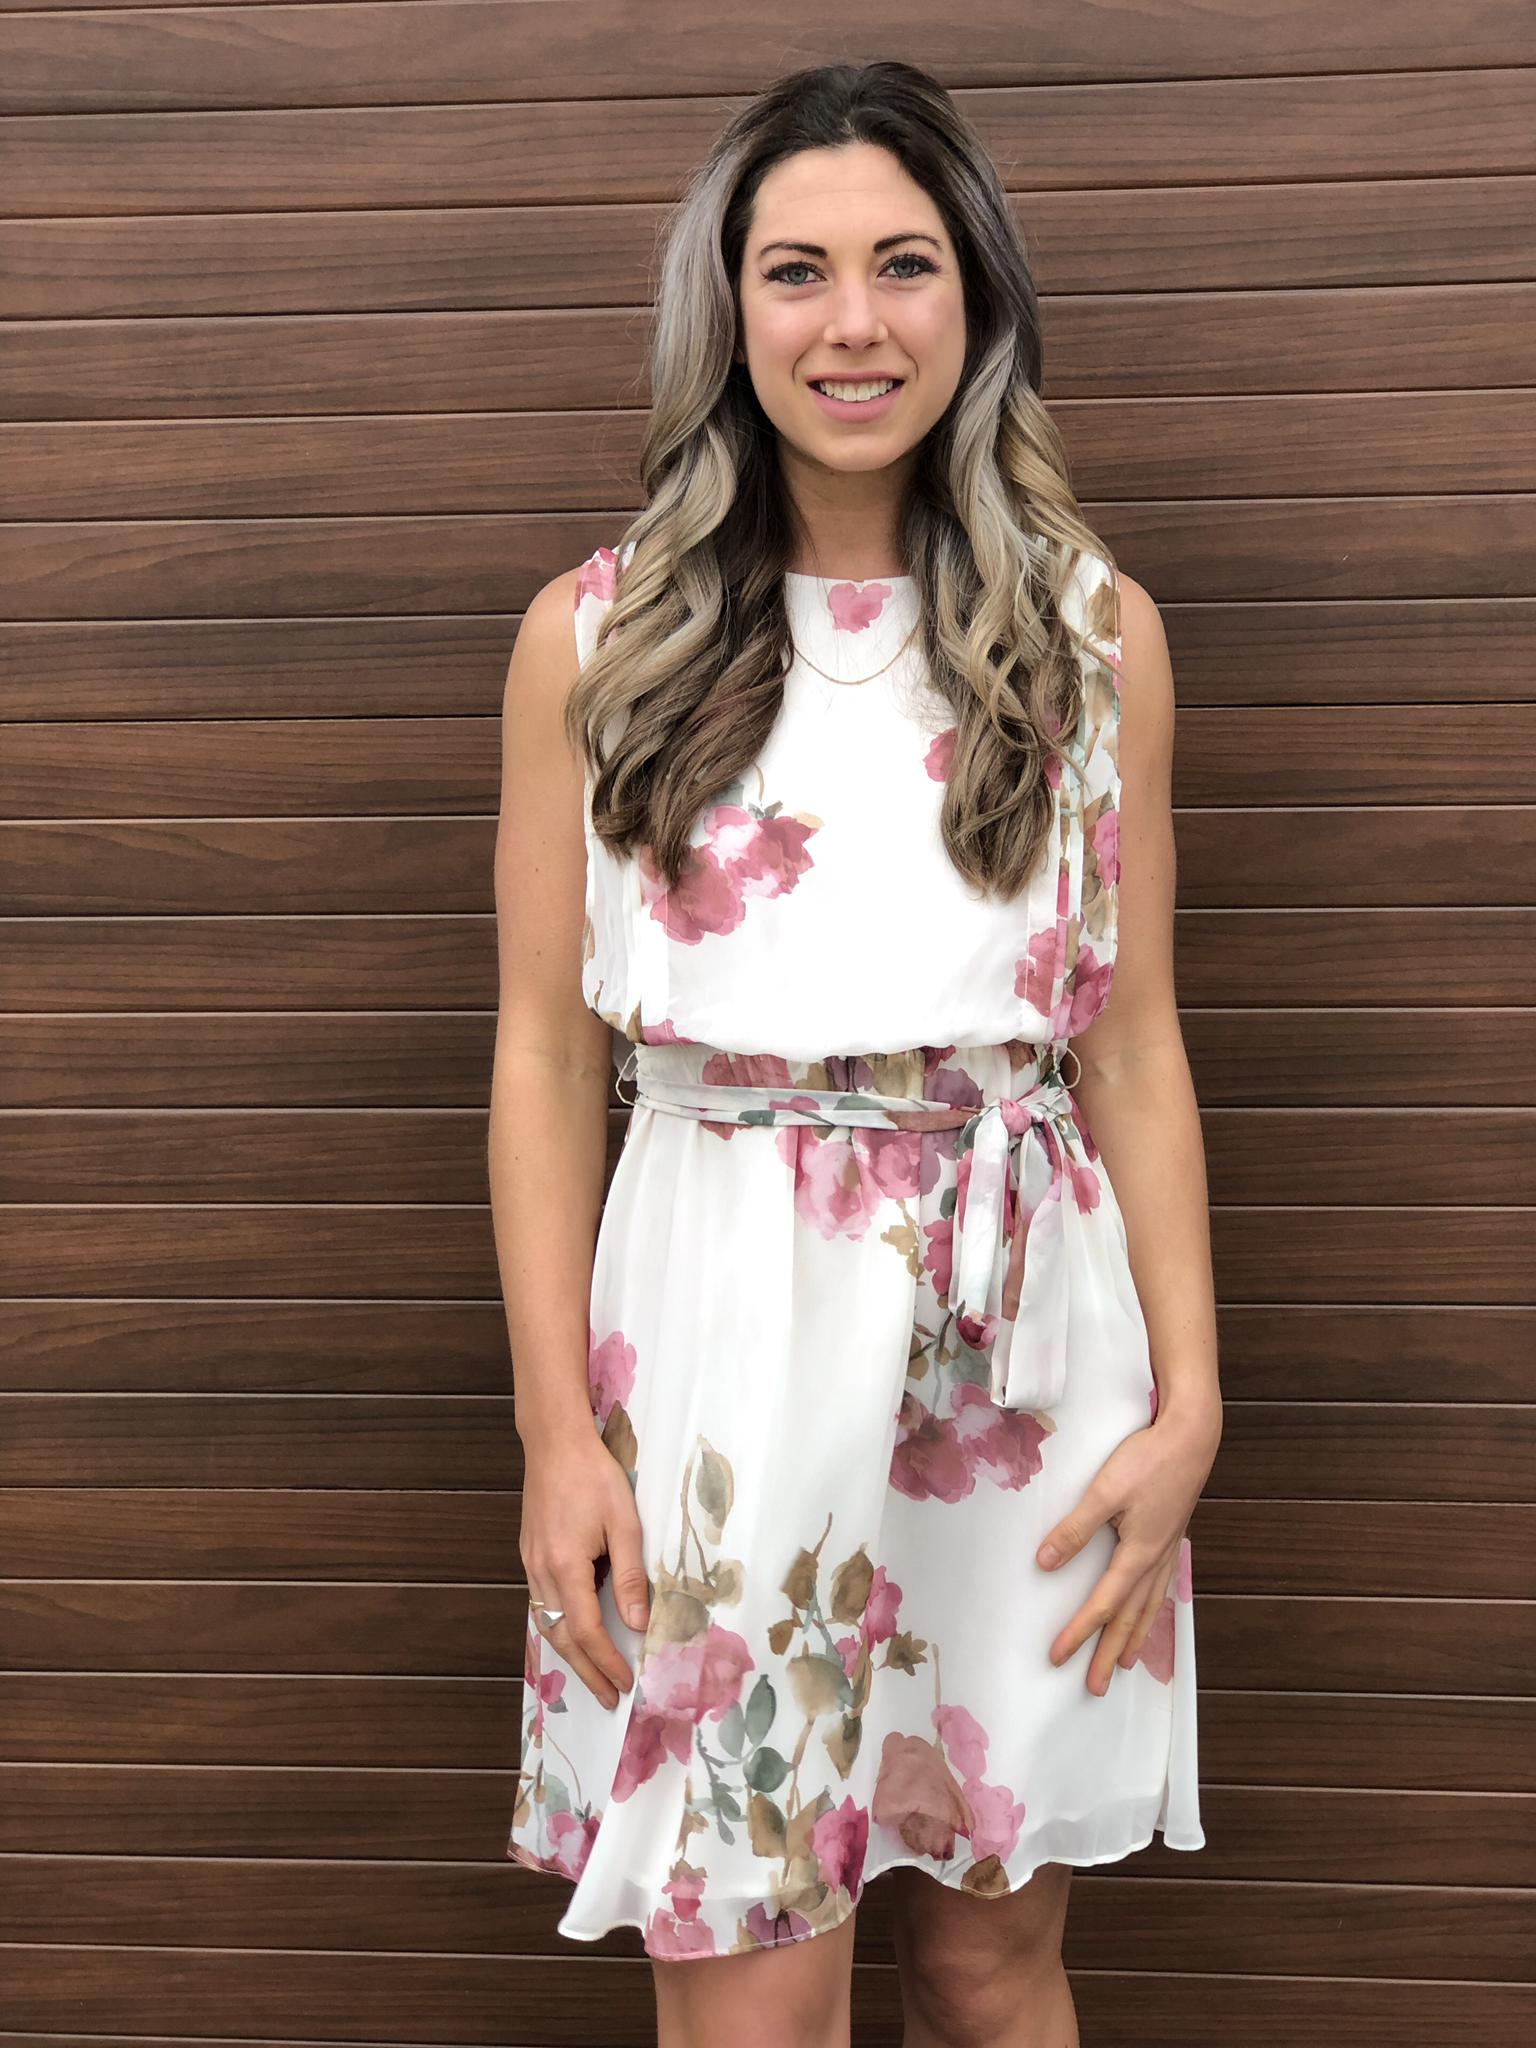 Ivory Blush Floral Dress 82030